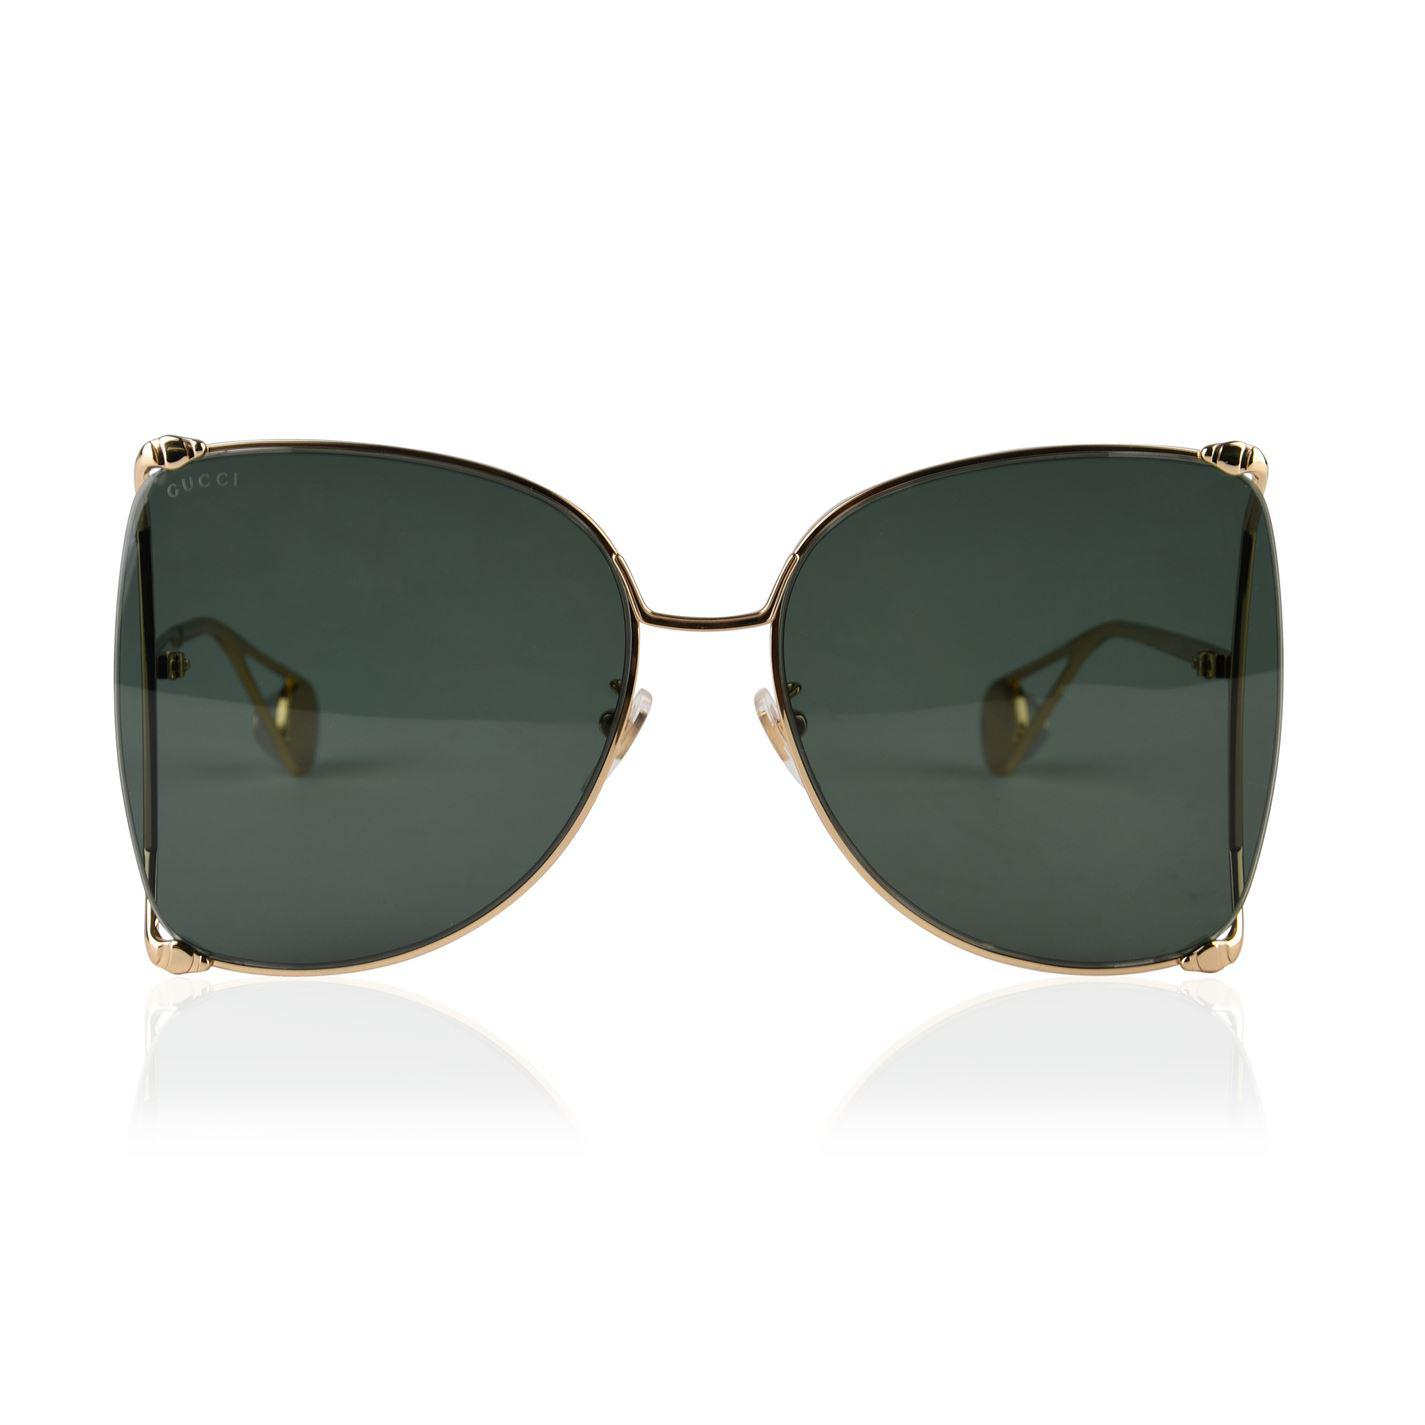 a54b4a58179 Gucci. Women s Gg0252s Round Frame Sunglasses